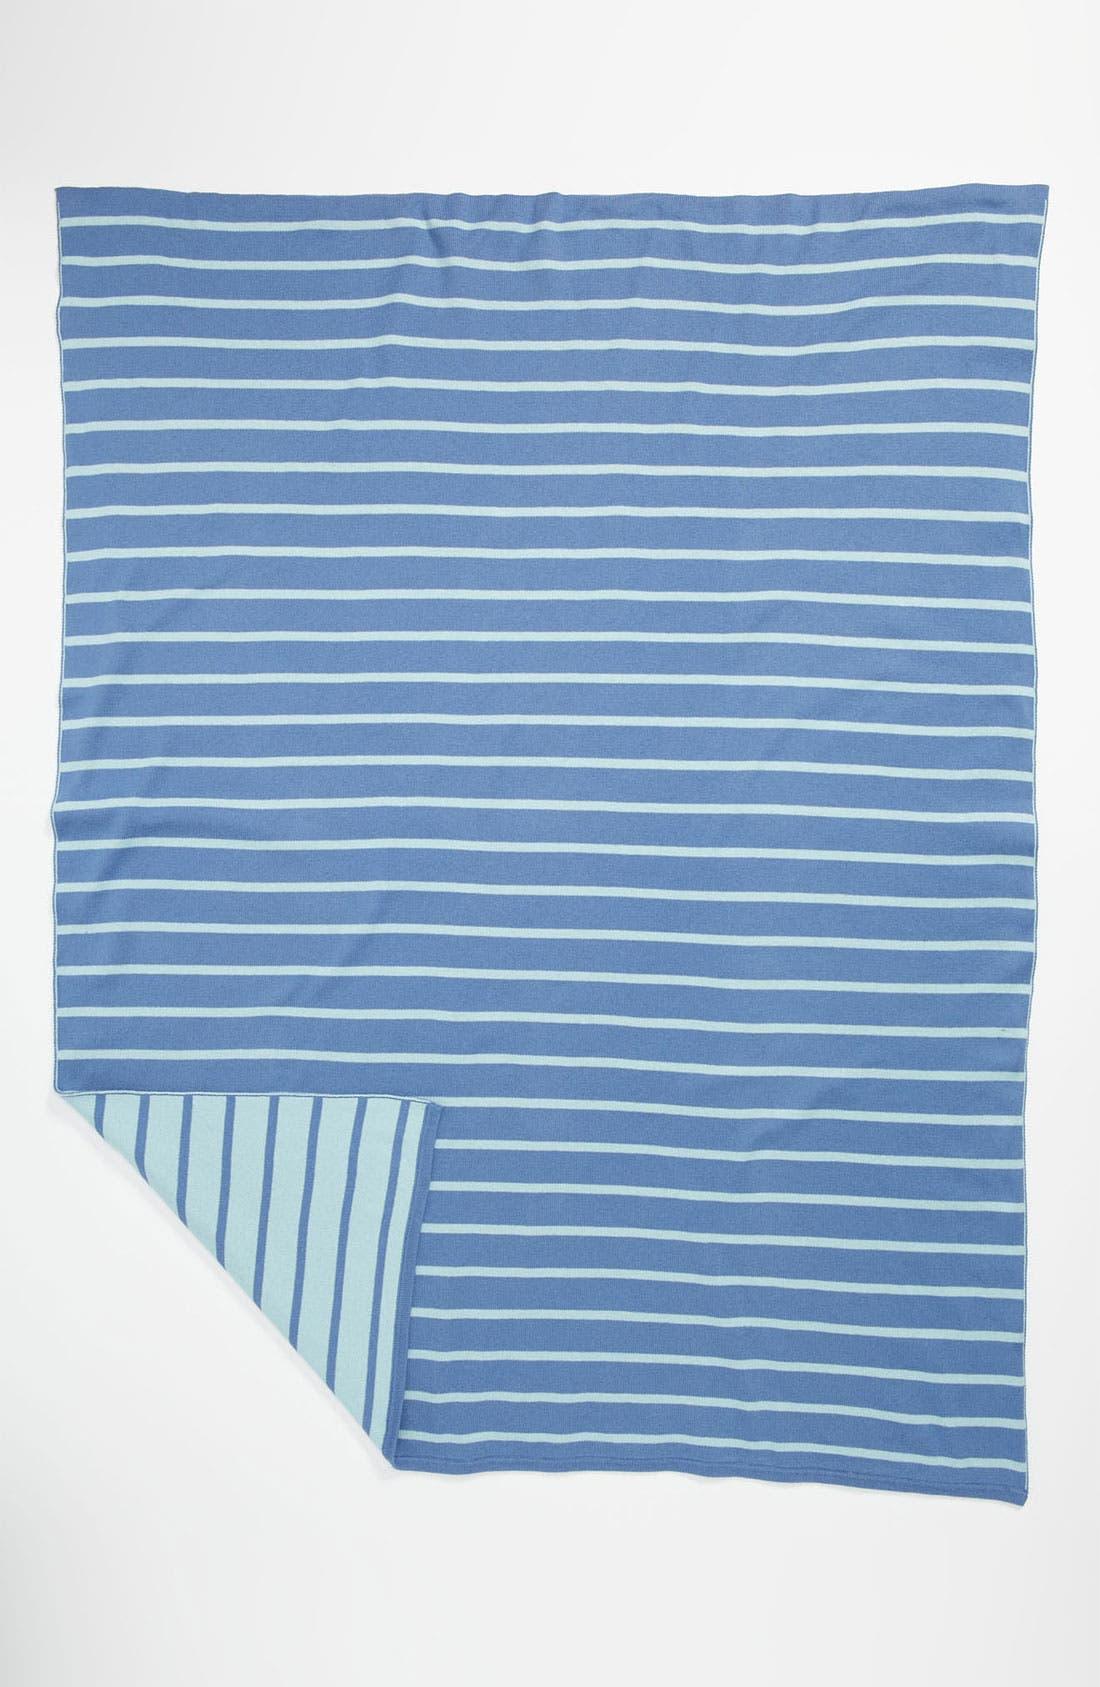 Main Image - Stem Baby 'Bright Stripe' Organic Cotton Blanket